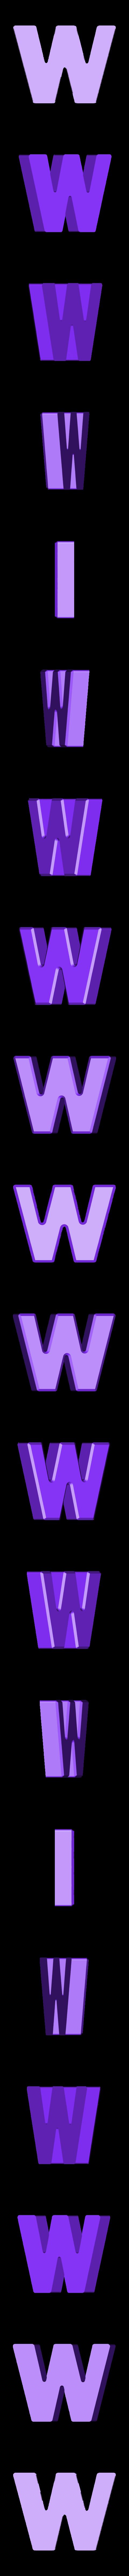 W.stl Download free STL file Letter Bowls • 3D print object, PrintedSolid